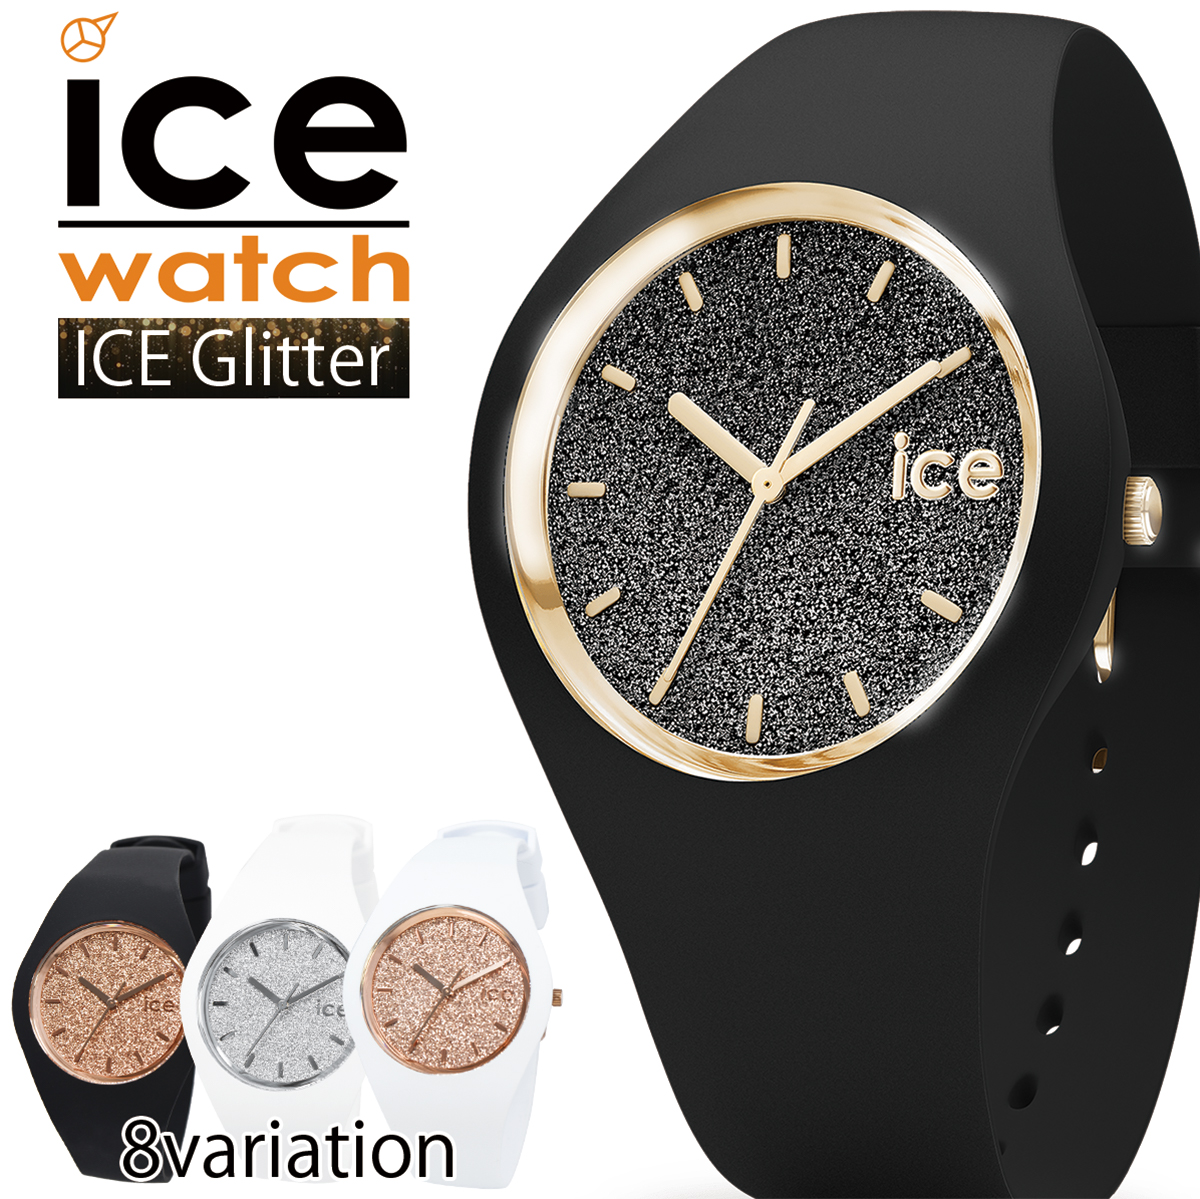 ice watch アイスウォッチ グリッター glitter レディース メンズ ユニセックス 腕時計 クオーツ ウォッチ プレゼント 贈り物 記念日 ギフト フォーマル カジュアル ペアウォッチ